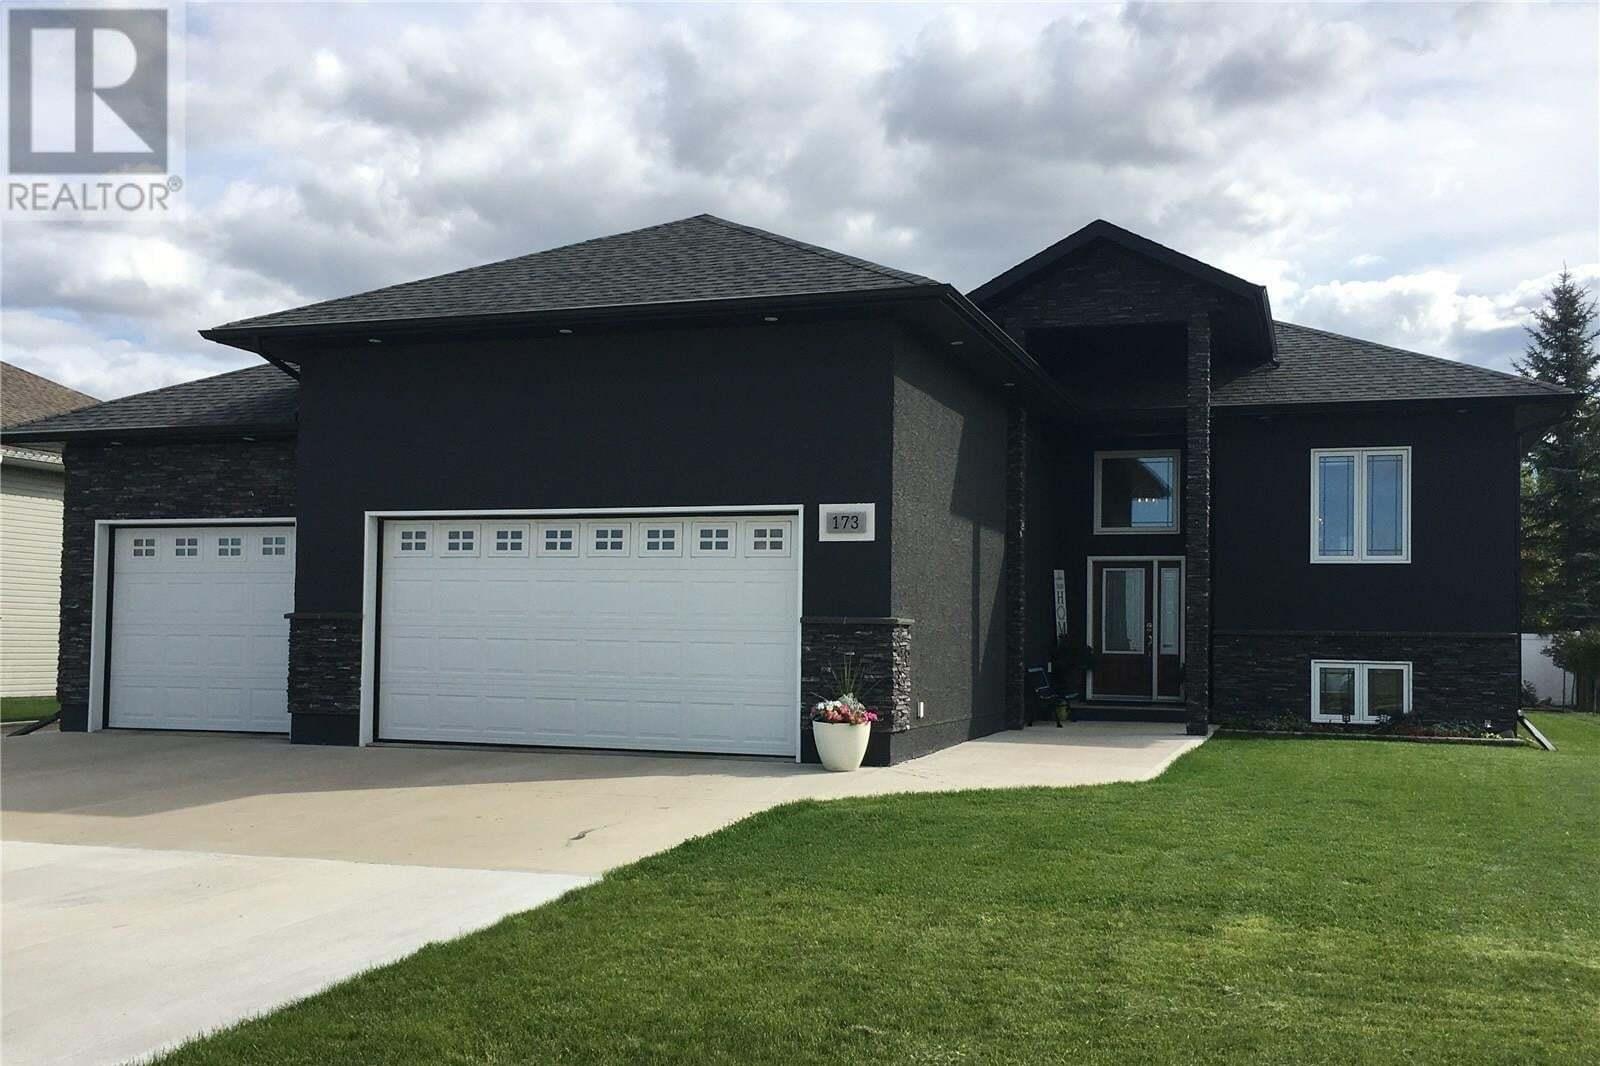 House for sale at 173 5th Ave Esterhazy Saskatchewan - MLS: SK821188